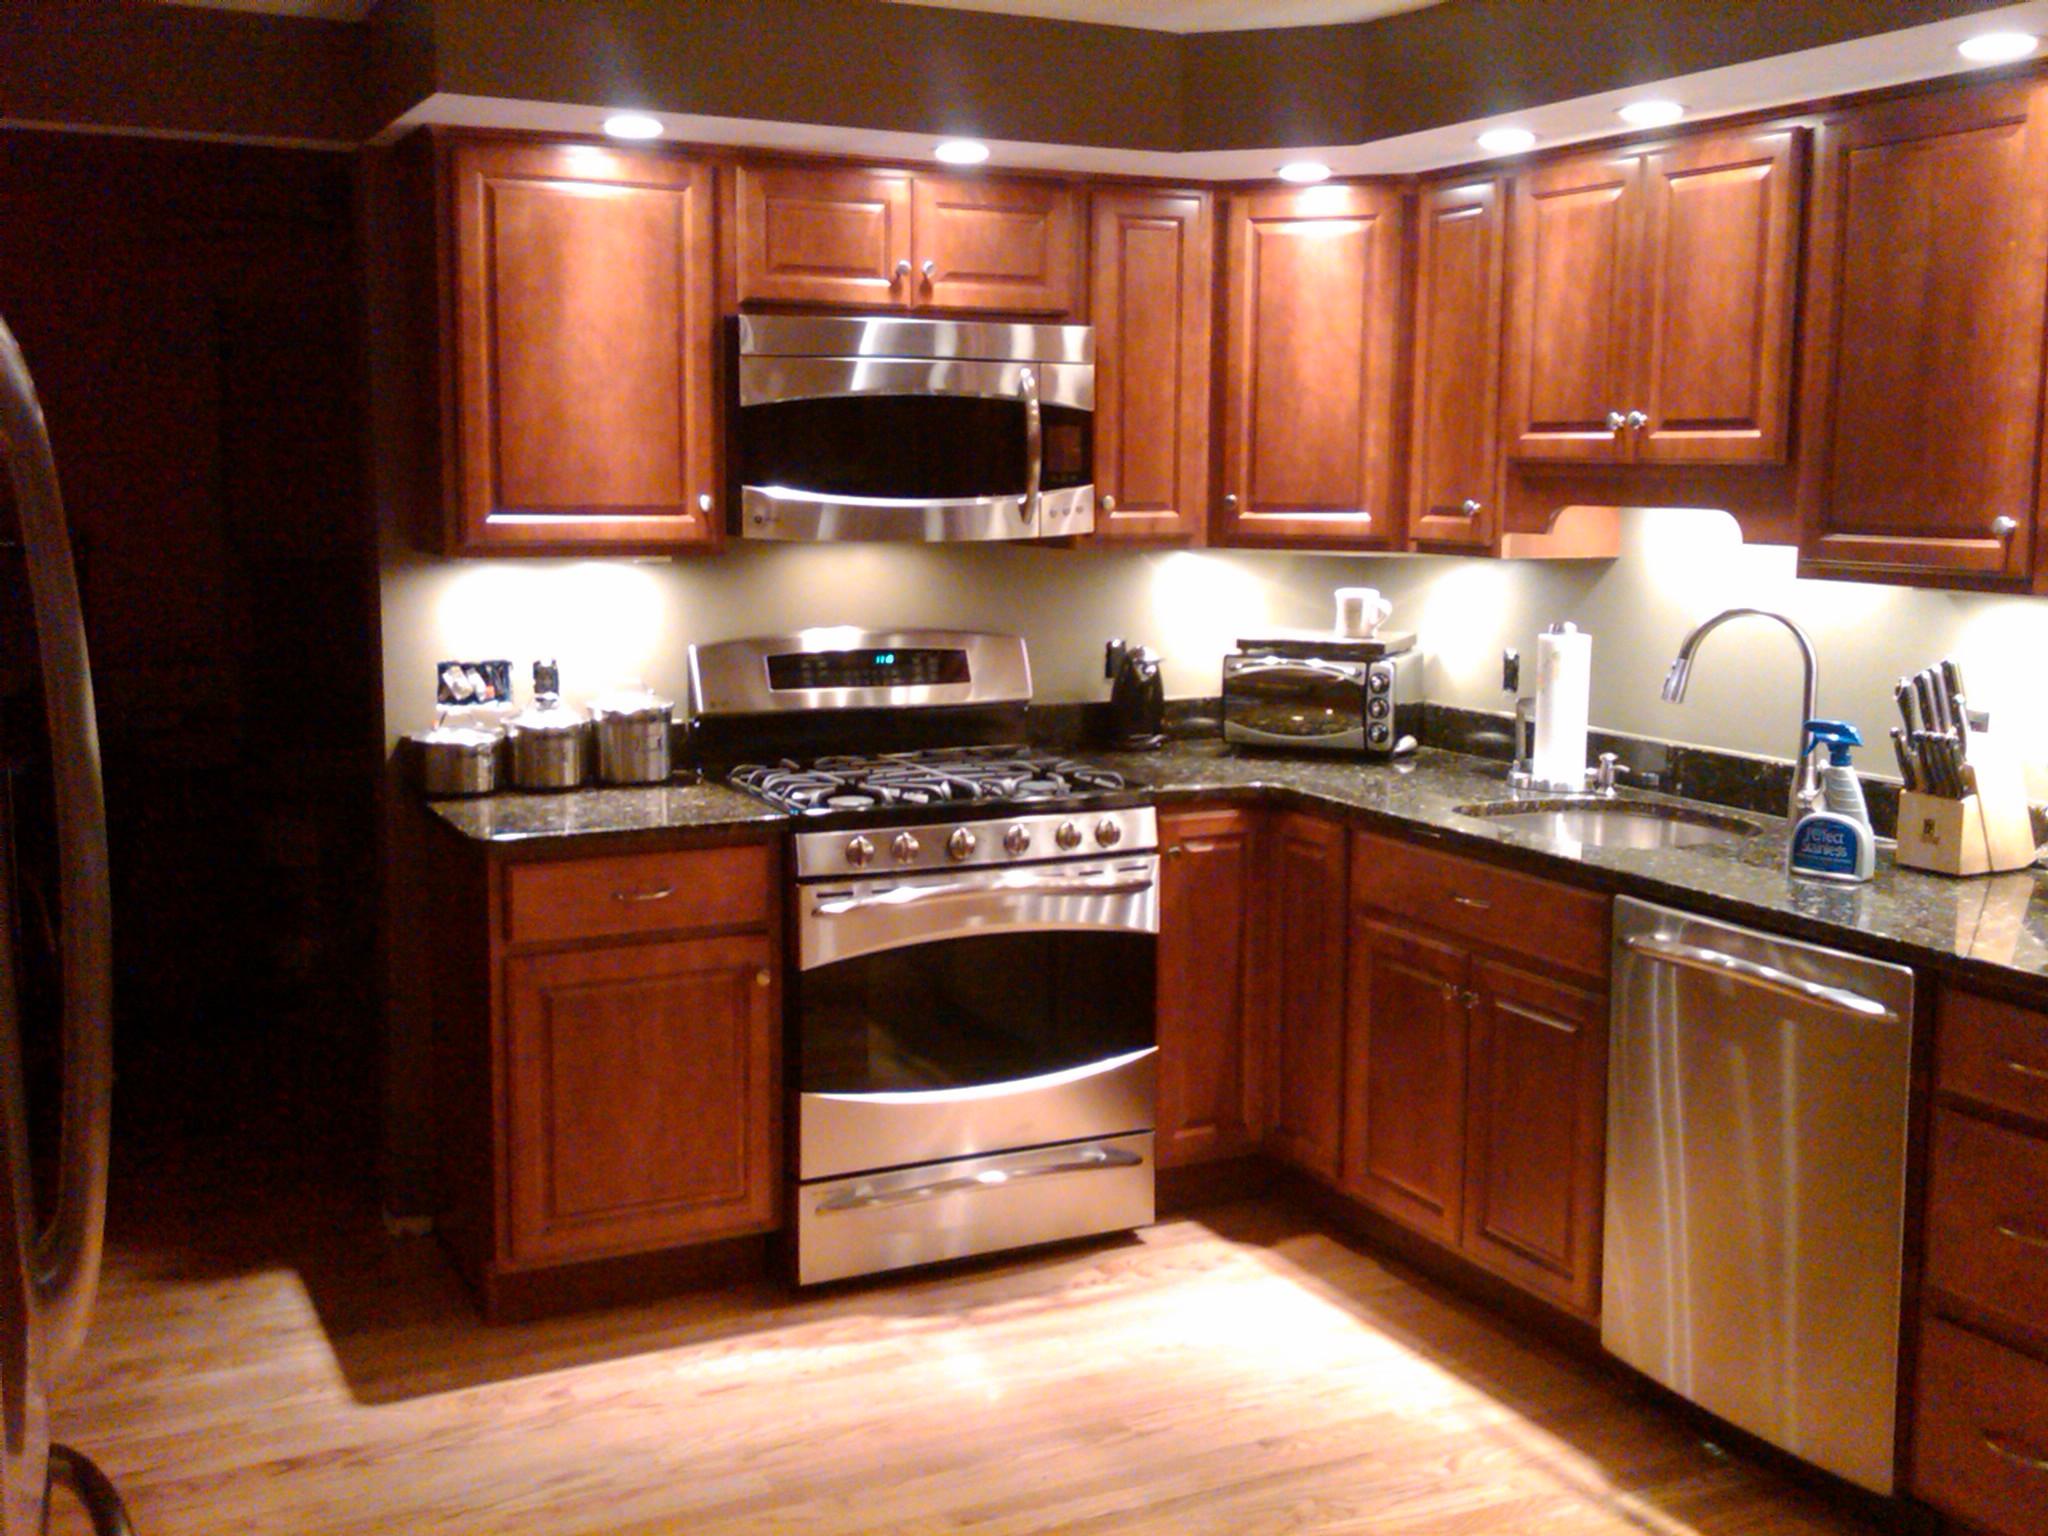 p 40 recessed lighting kitchen I